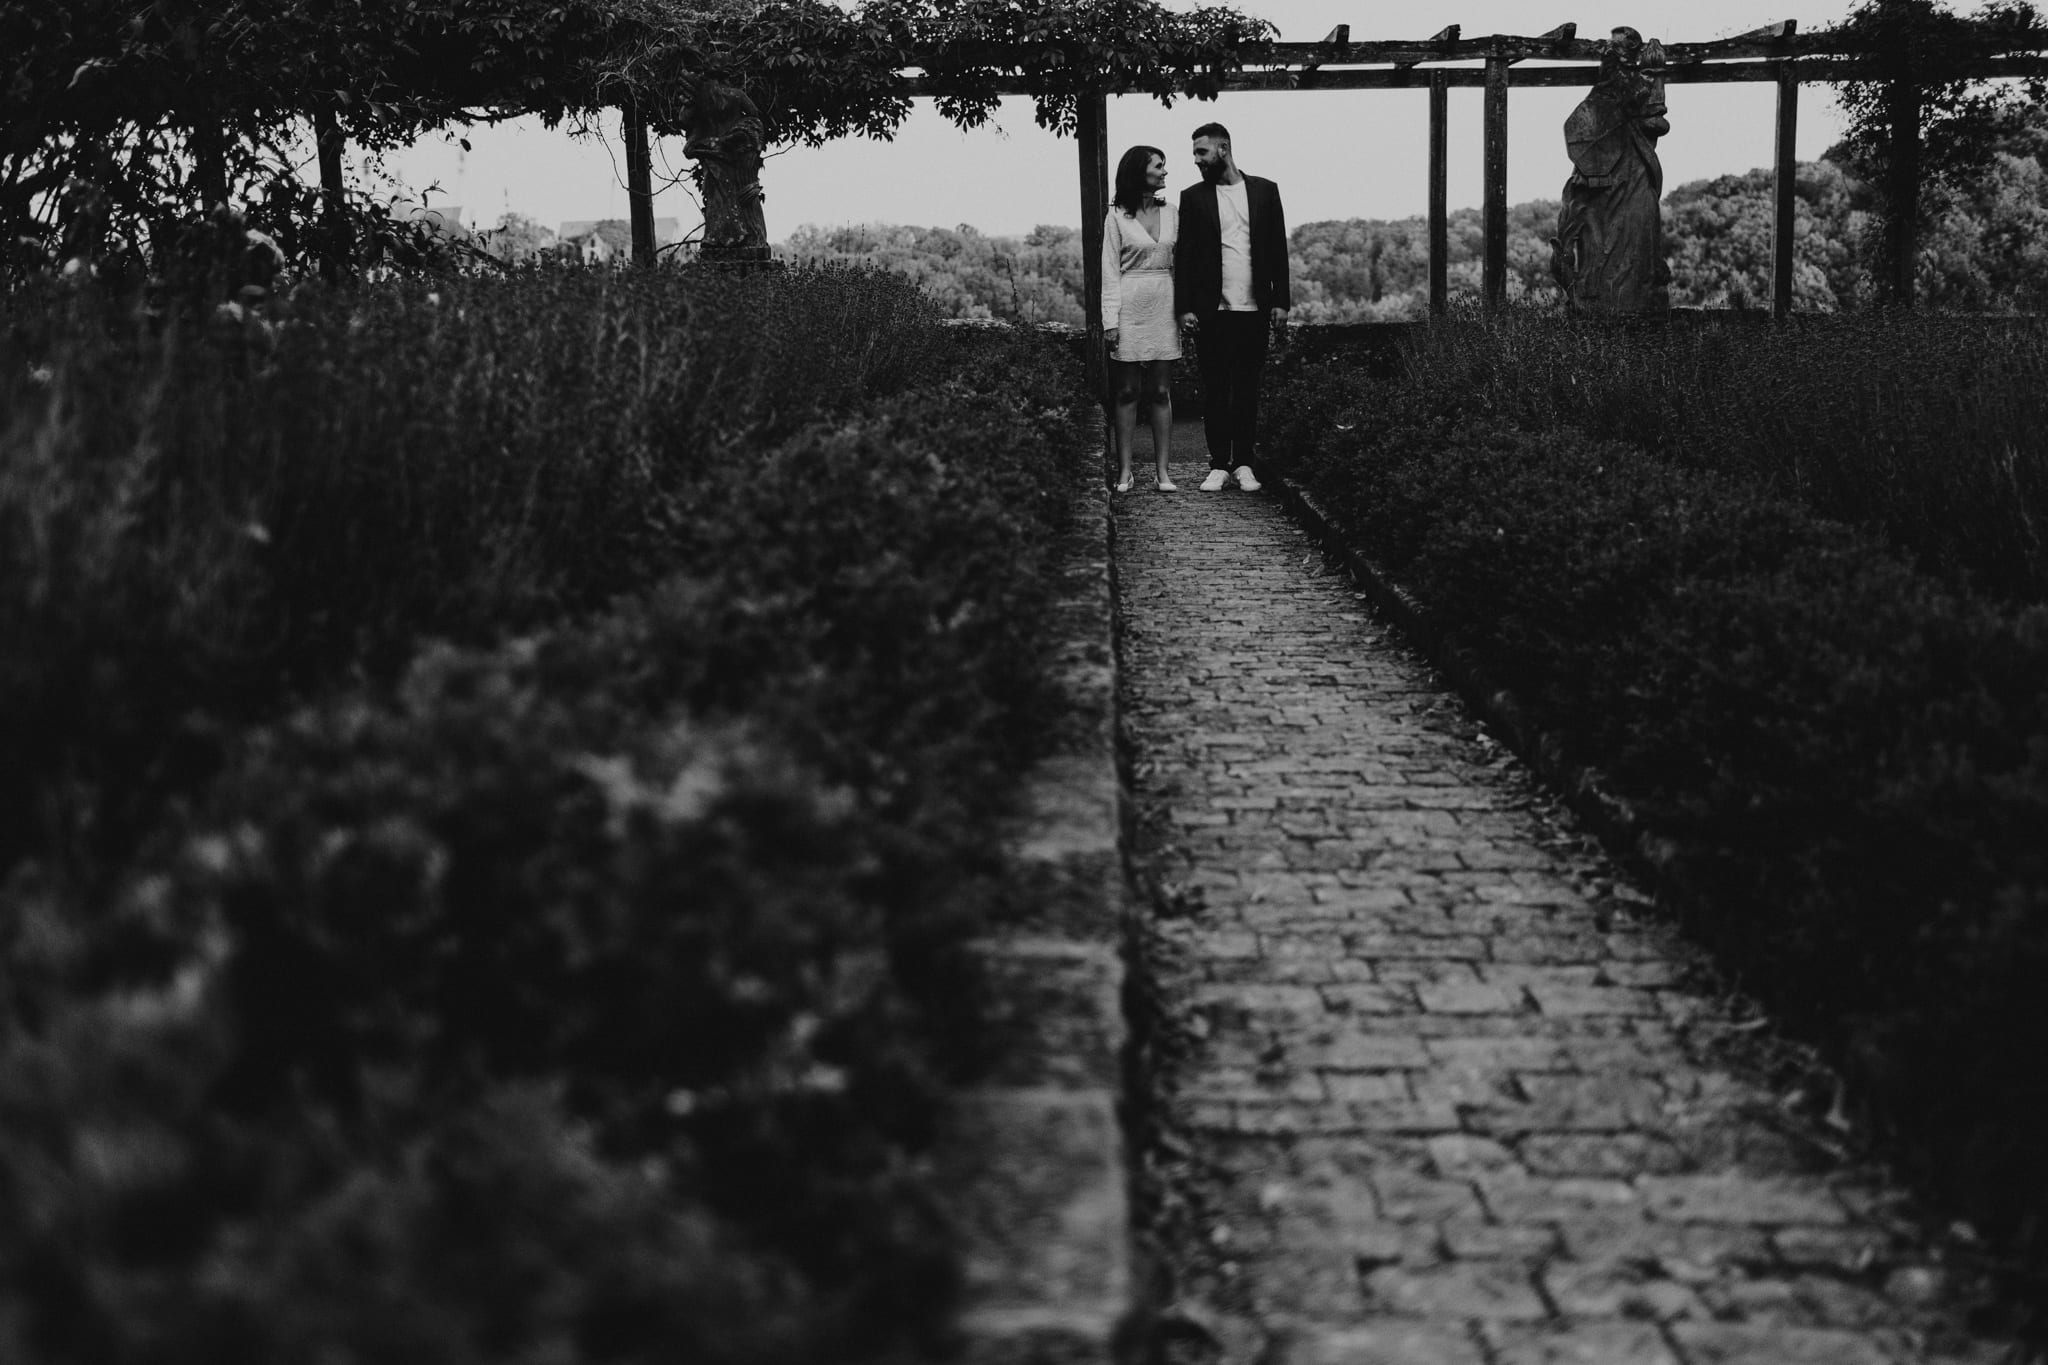 wesele w bawarii rothenburg agahipo 114